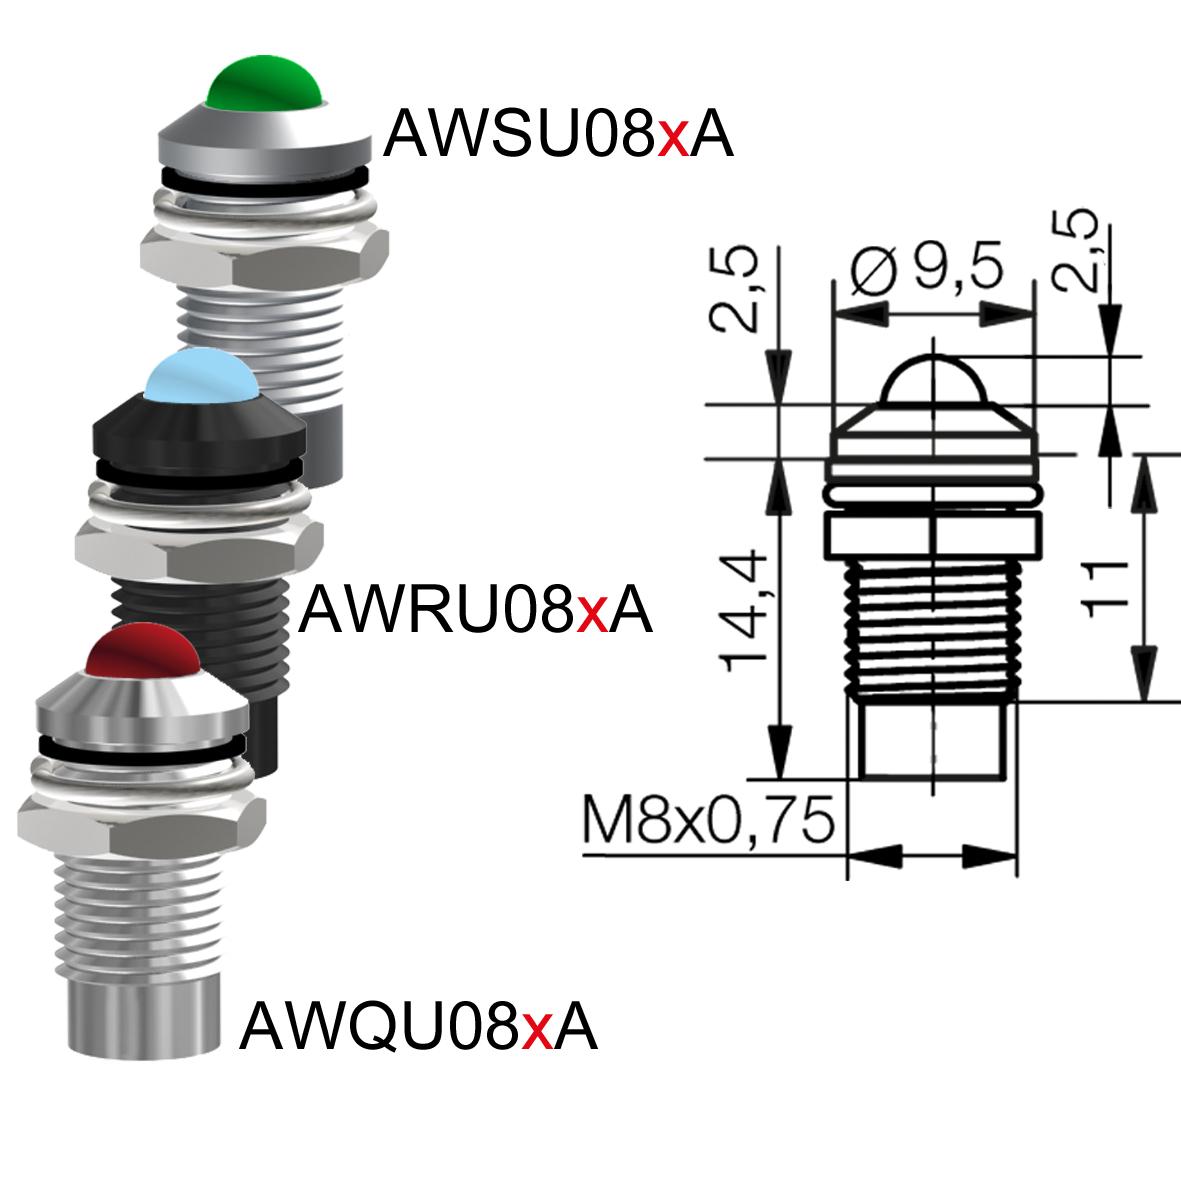 LED-Leuchtelement Ø8mm IP67 Innenreflektor / Außenreflektor